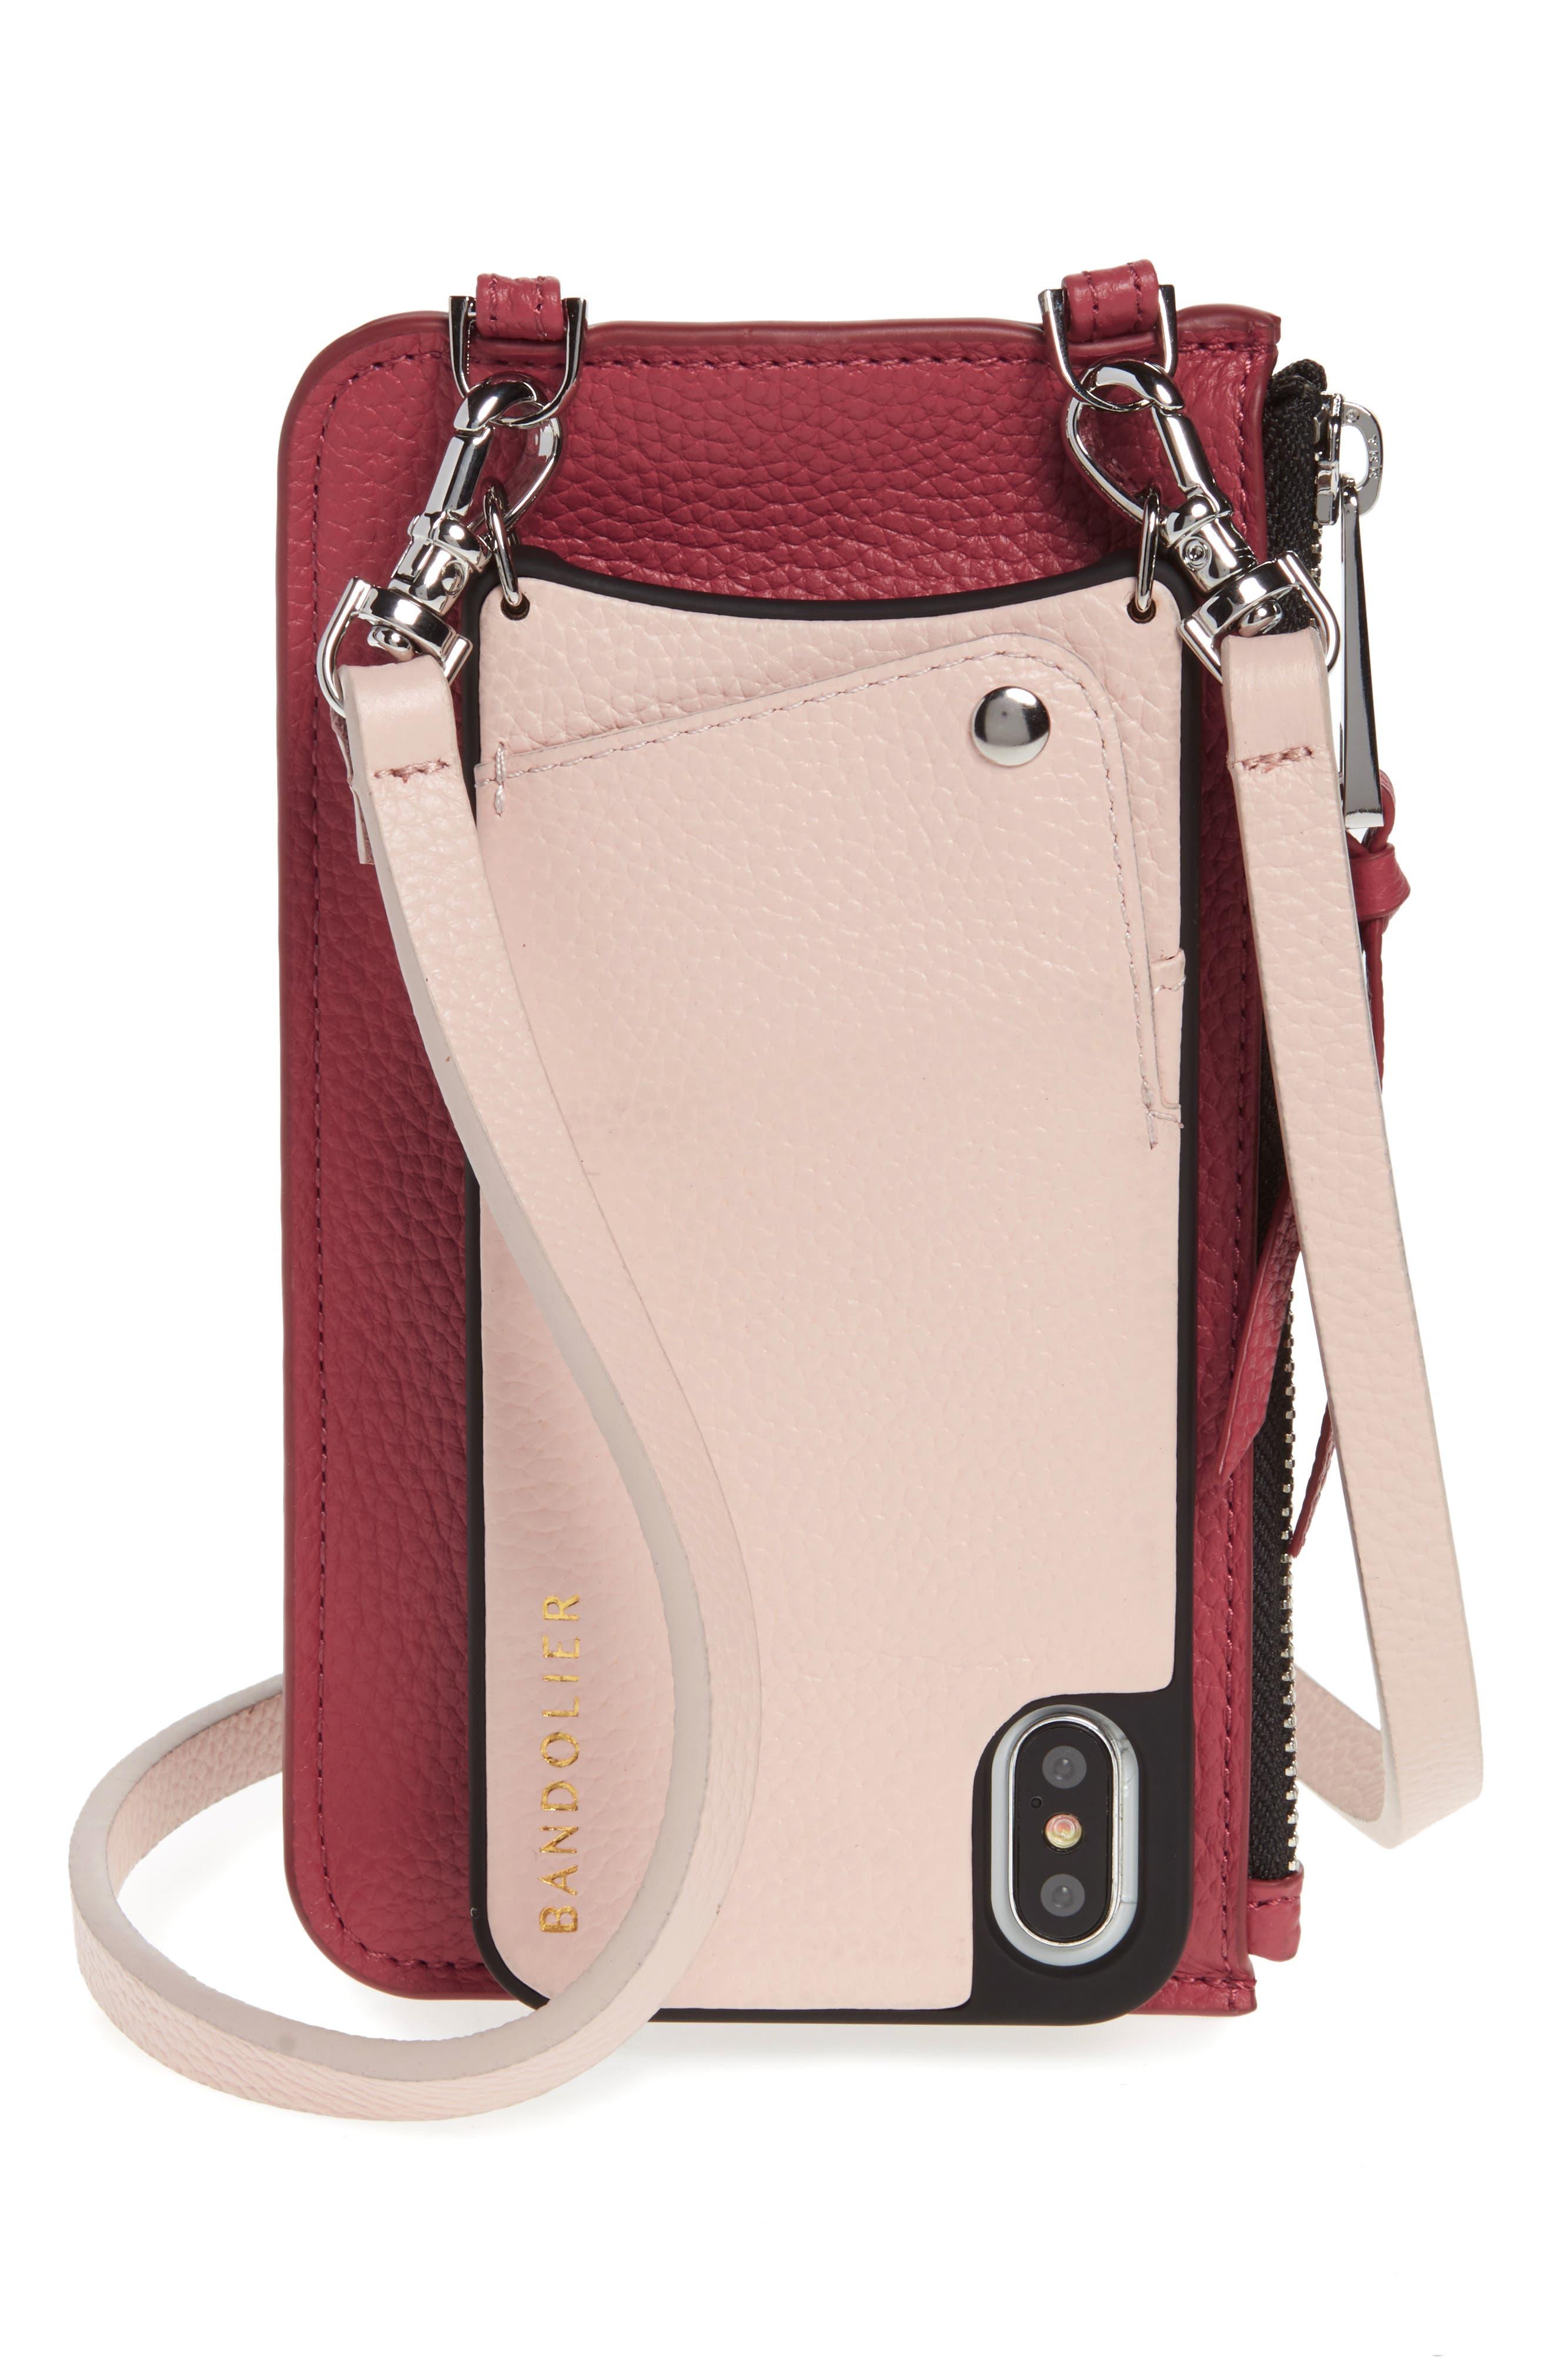 BANDOLIER,                             Emma Leather iPhone X/Xs Crossbody Case,                             Main thumbnail 1, color,                             PINK/ MAUVE